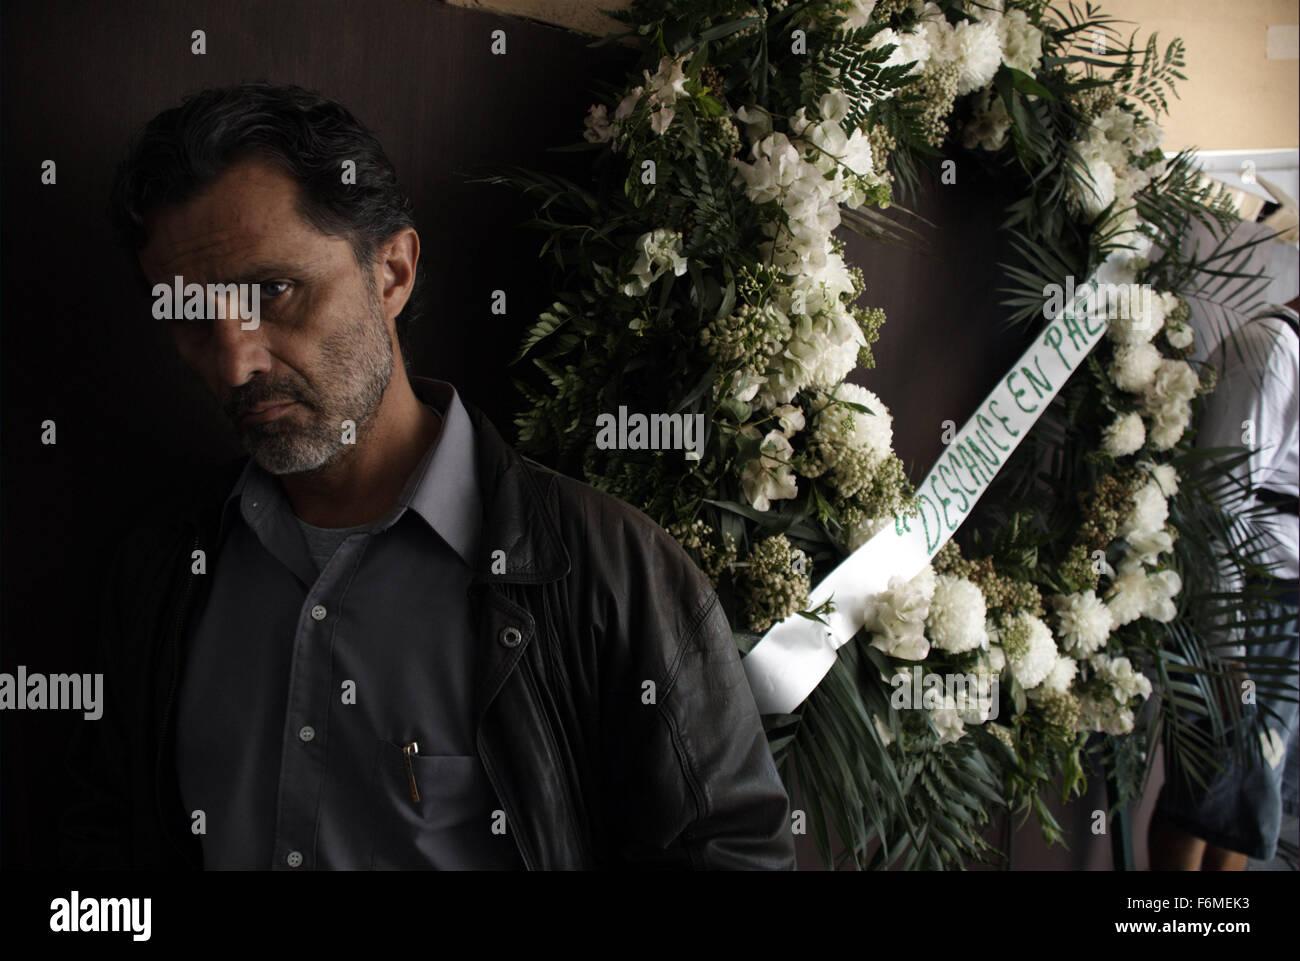 RELEASE DATE: October 18, 2009. MOVIE TITLE: Under the Salt. STUDIO: Fidecine. PLOT: A series of murders leads commander - Stock Image